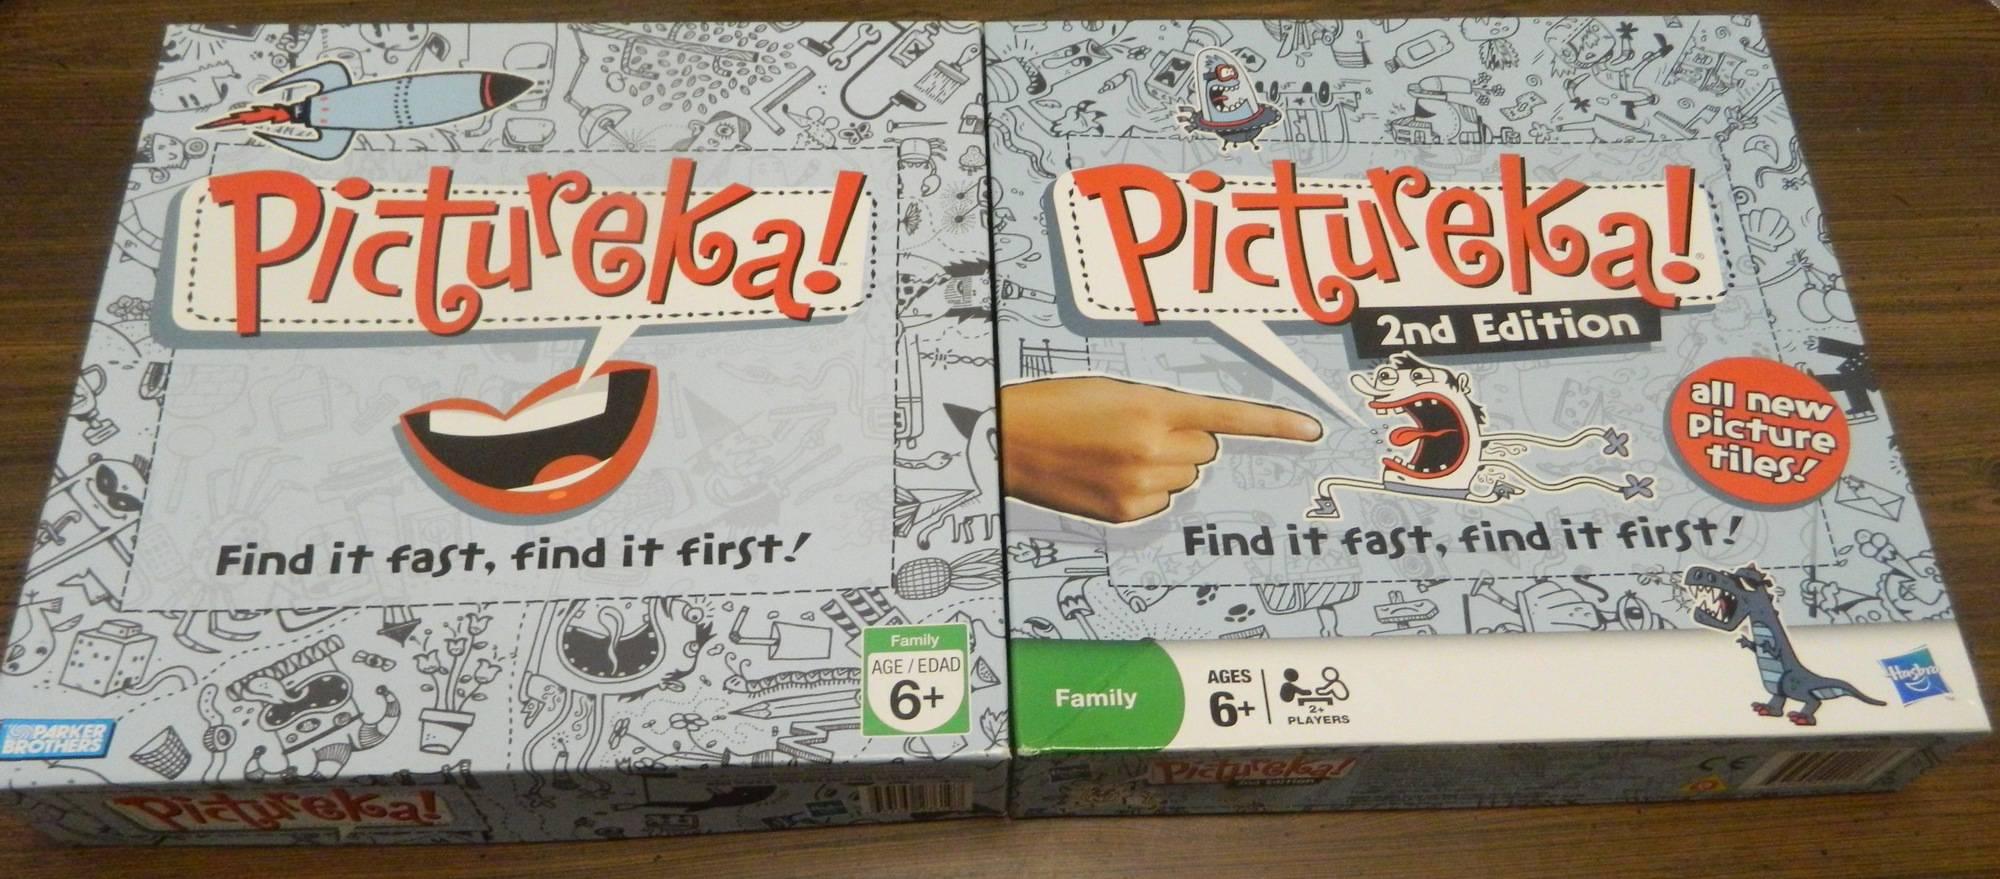 Box for Pictureka